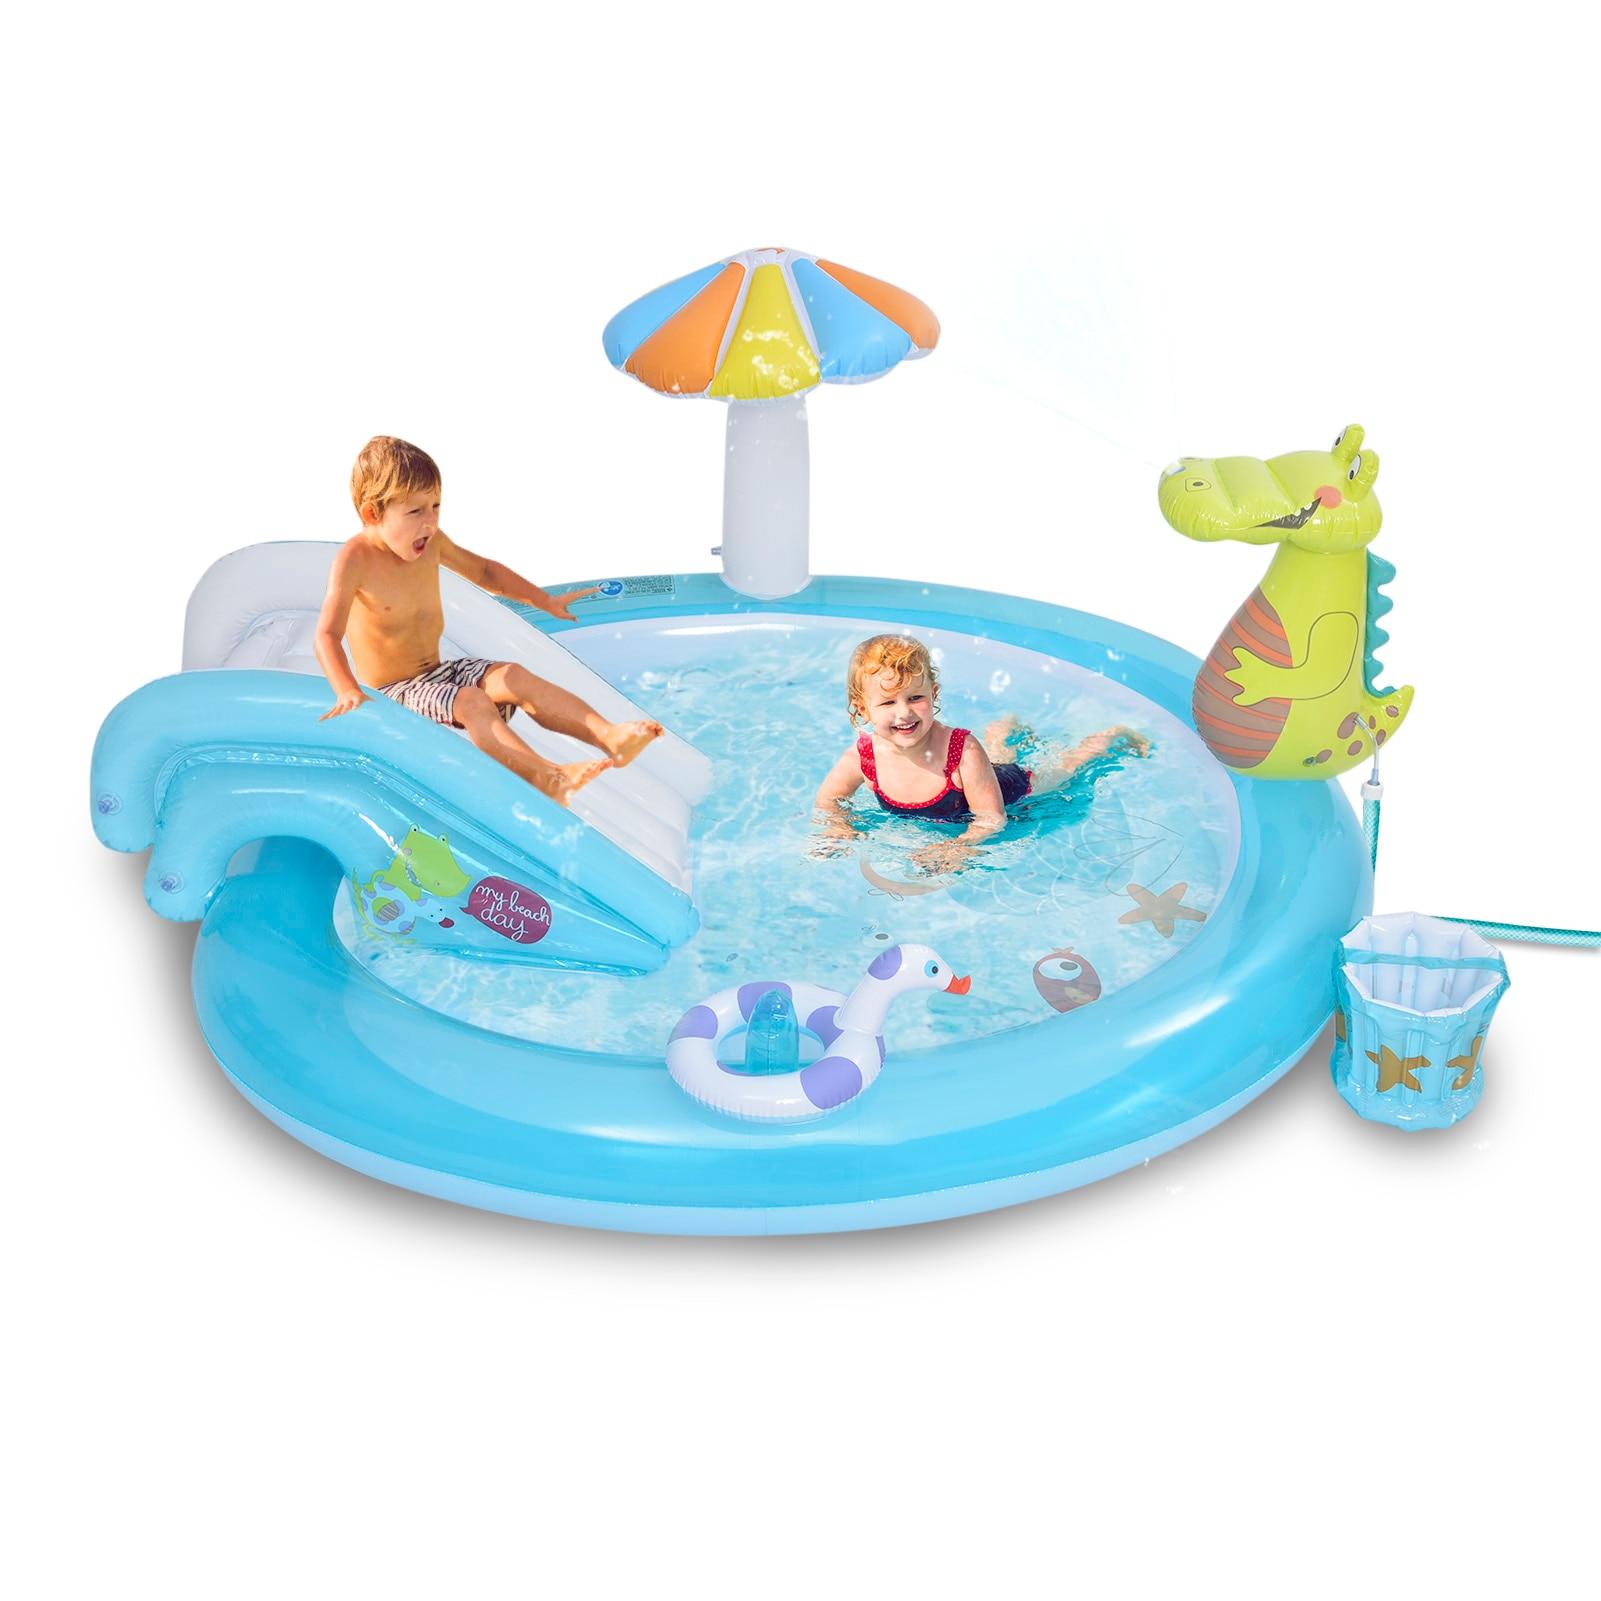 Kid Lawn Swimming Pool Crocodile Spray Water Slide Family Pool Ocean Ball Large Pool Inflatable Play Center Kids Water Fun Pool